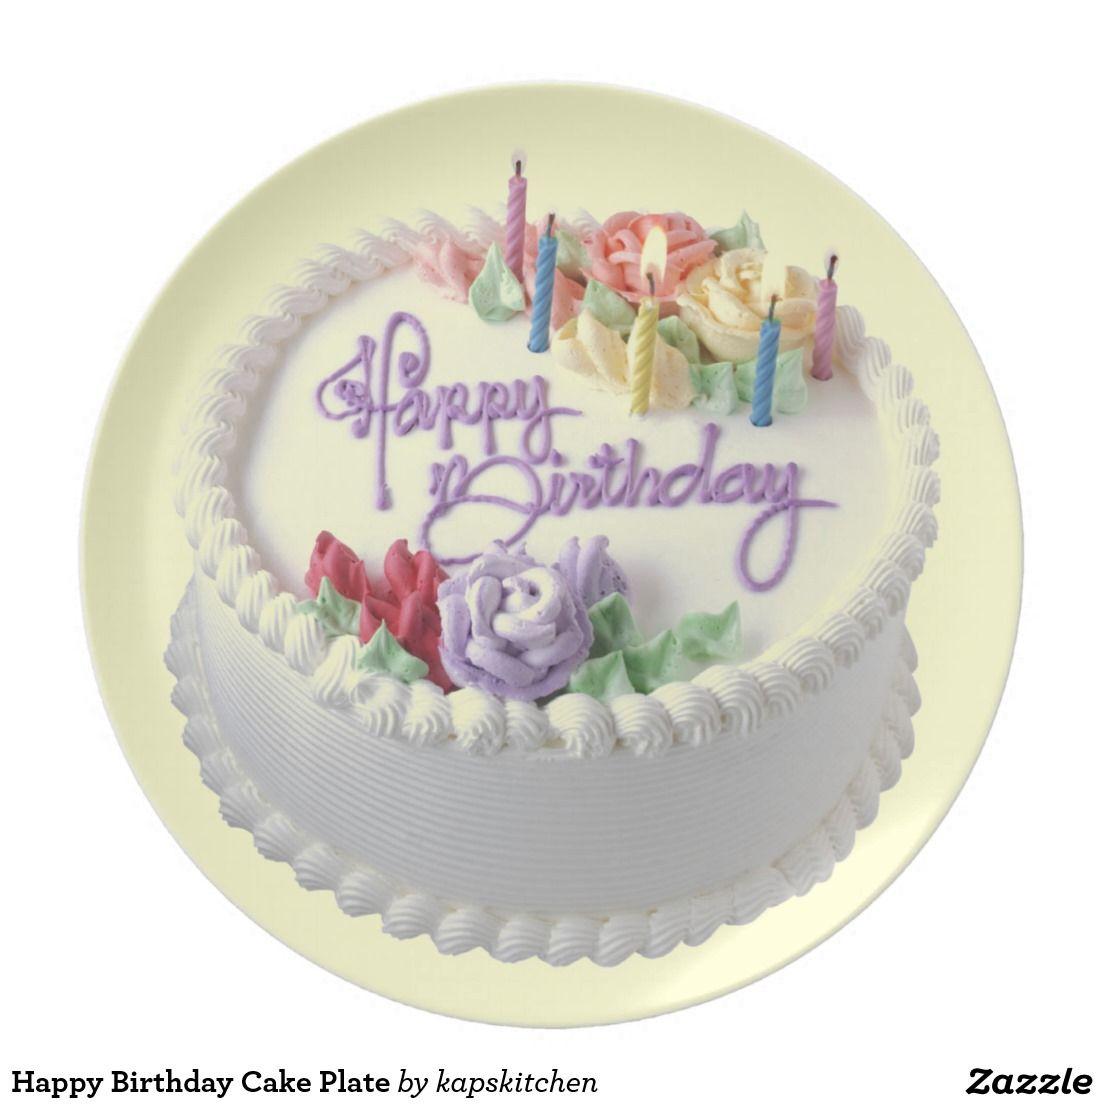 Stupendous Happy Birthday Cake Plate Zazzle Com Happy Birthday Cakes Birthday Cards Printable Trancafe Filternl